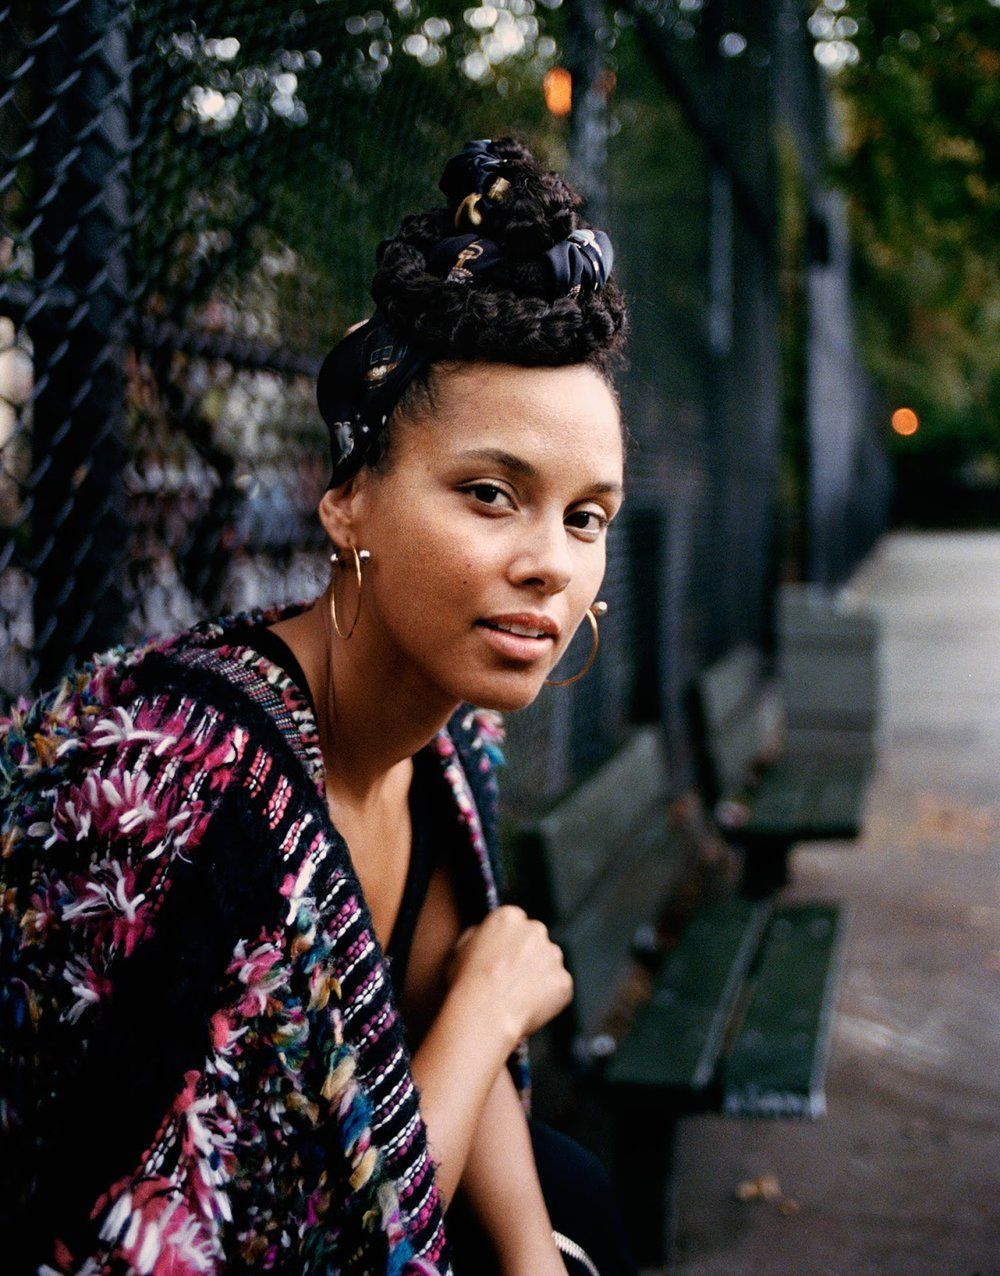 Alicia Keys On No Makeup Here Empowerment Lensed By Quentin De Brey Anne Of Carversville Alicia Keys Black Girls Rock Alicia Keys Style